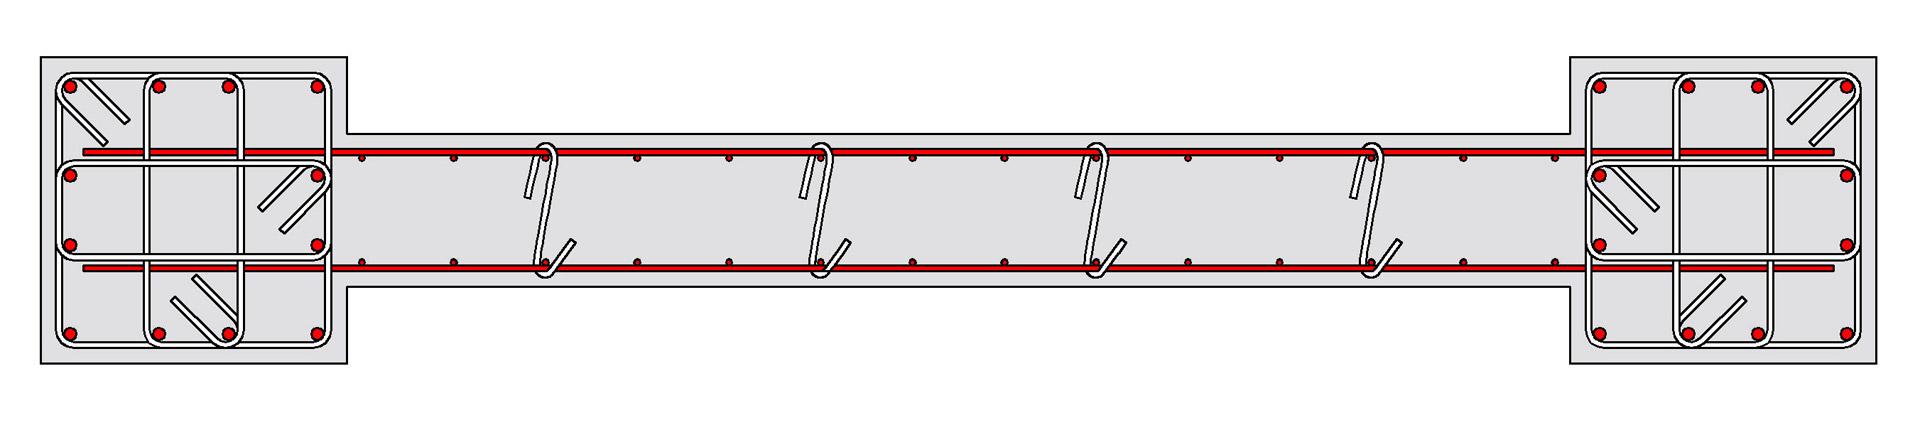 shear wall design - Monza berglauf-verband com